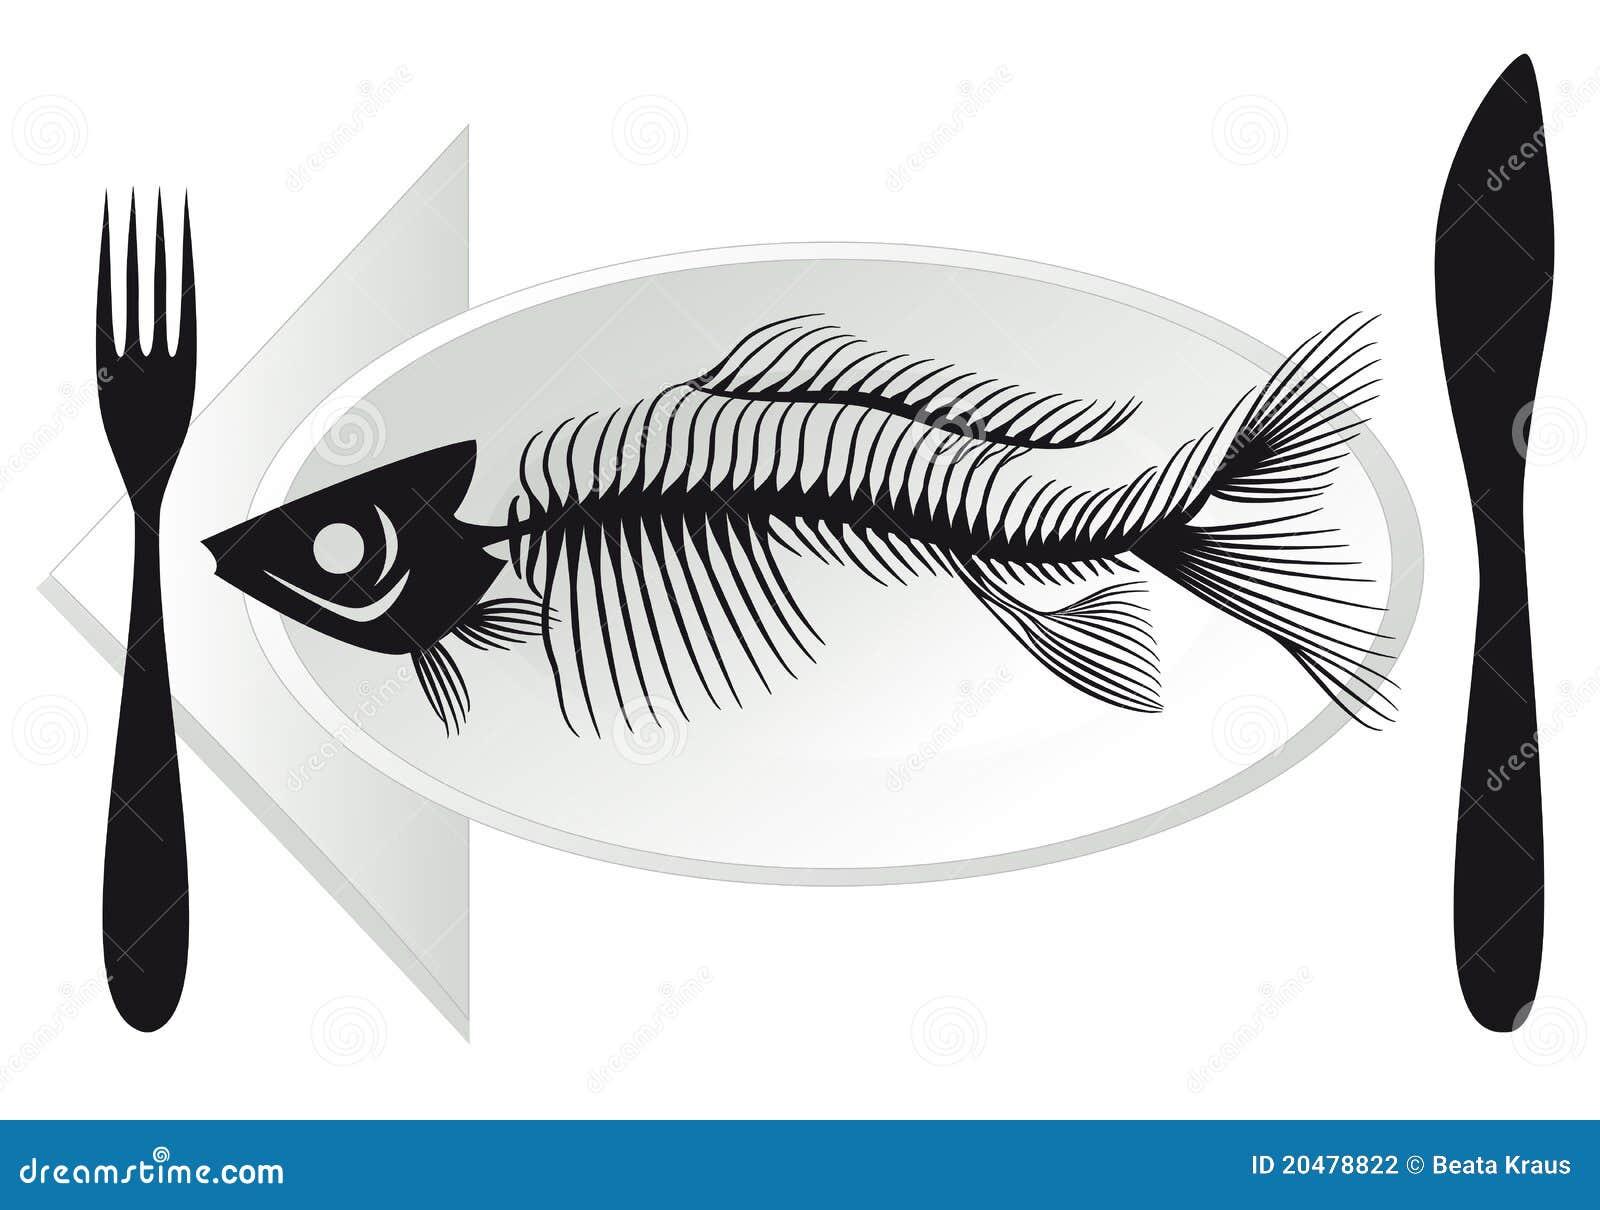 Fish bones on plate stock photography image 20478822 for Fish bones restaurant